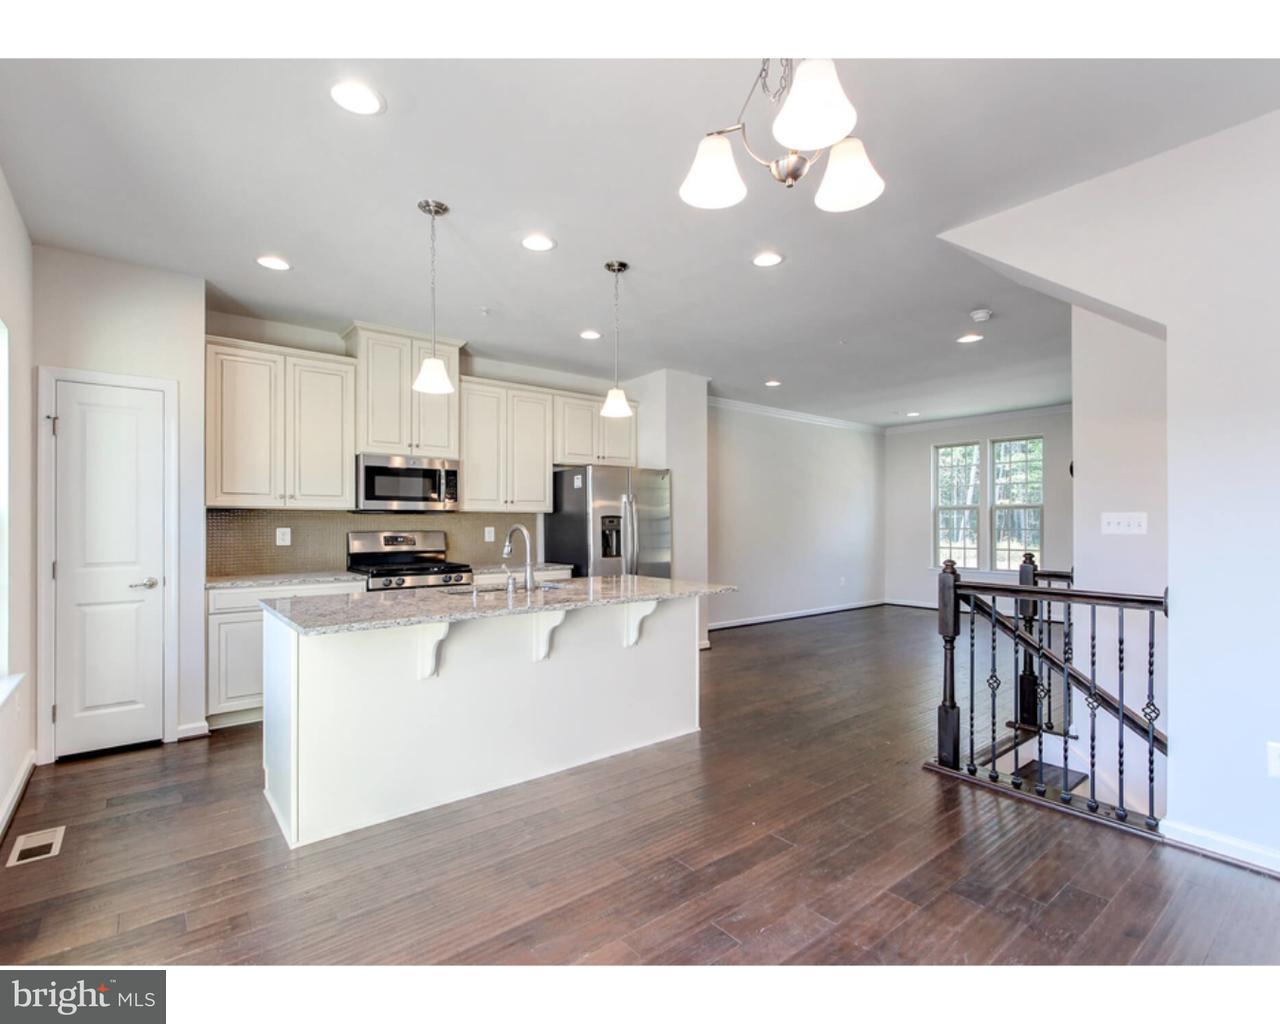 12 MARKET ST, SOUDERTON - Listed at $279,990, SOUDERTON